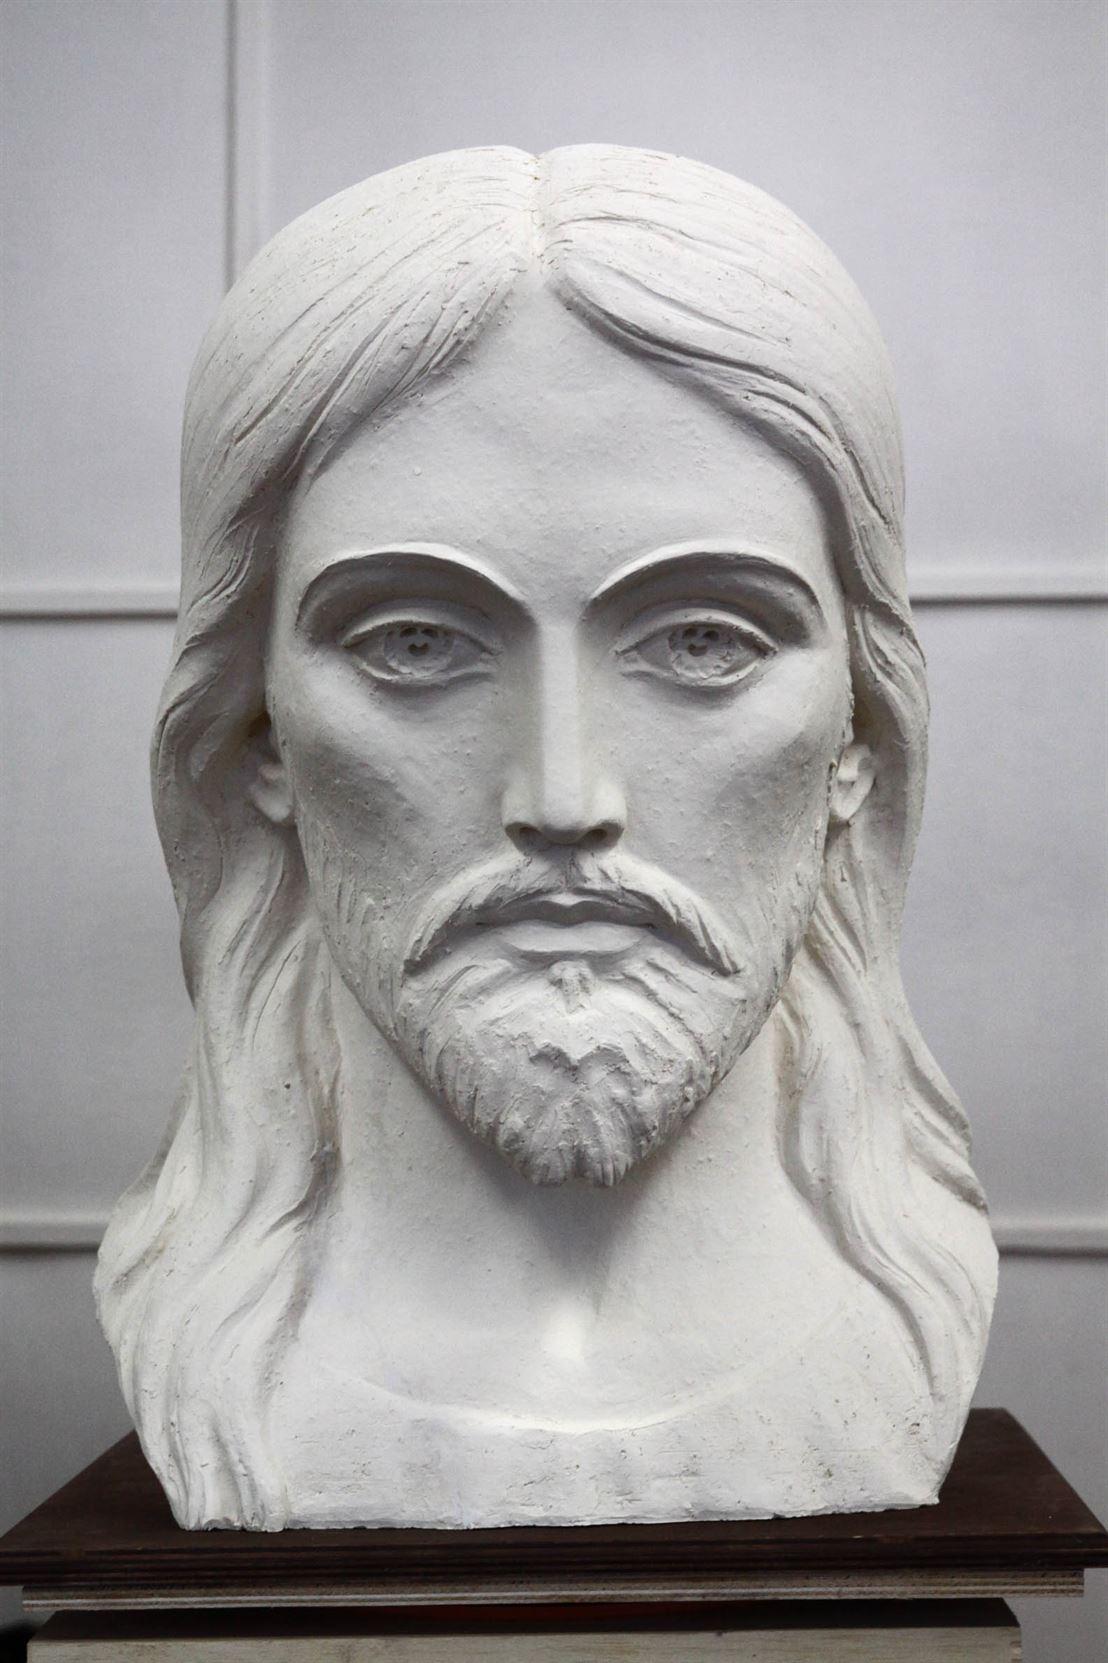 IMG 0022 - Христос. 2010.